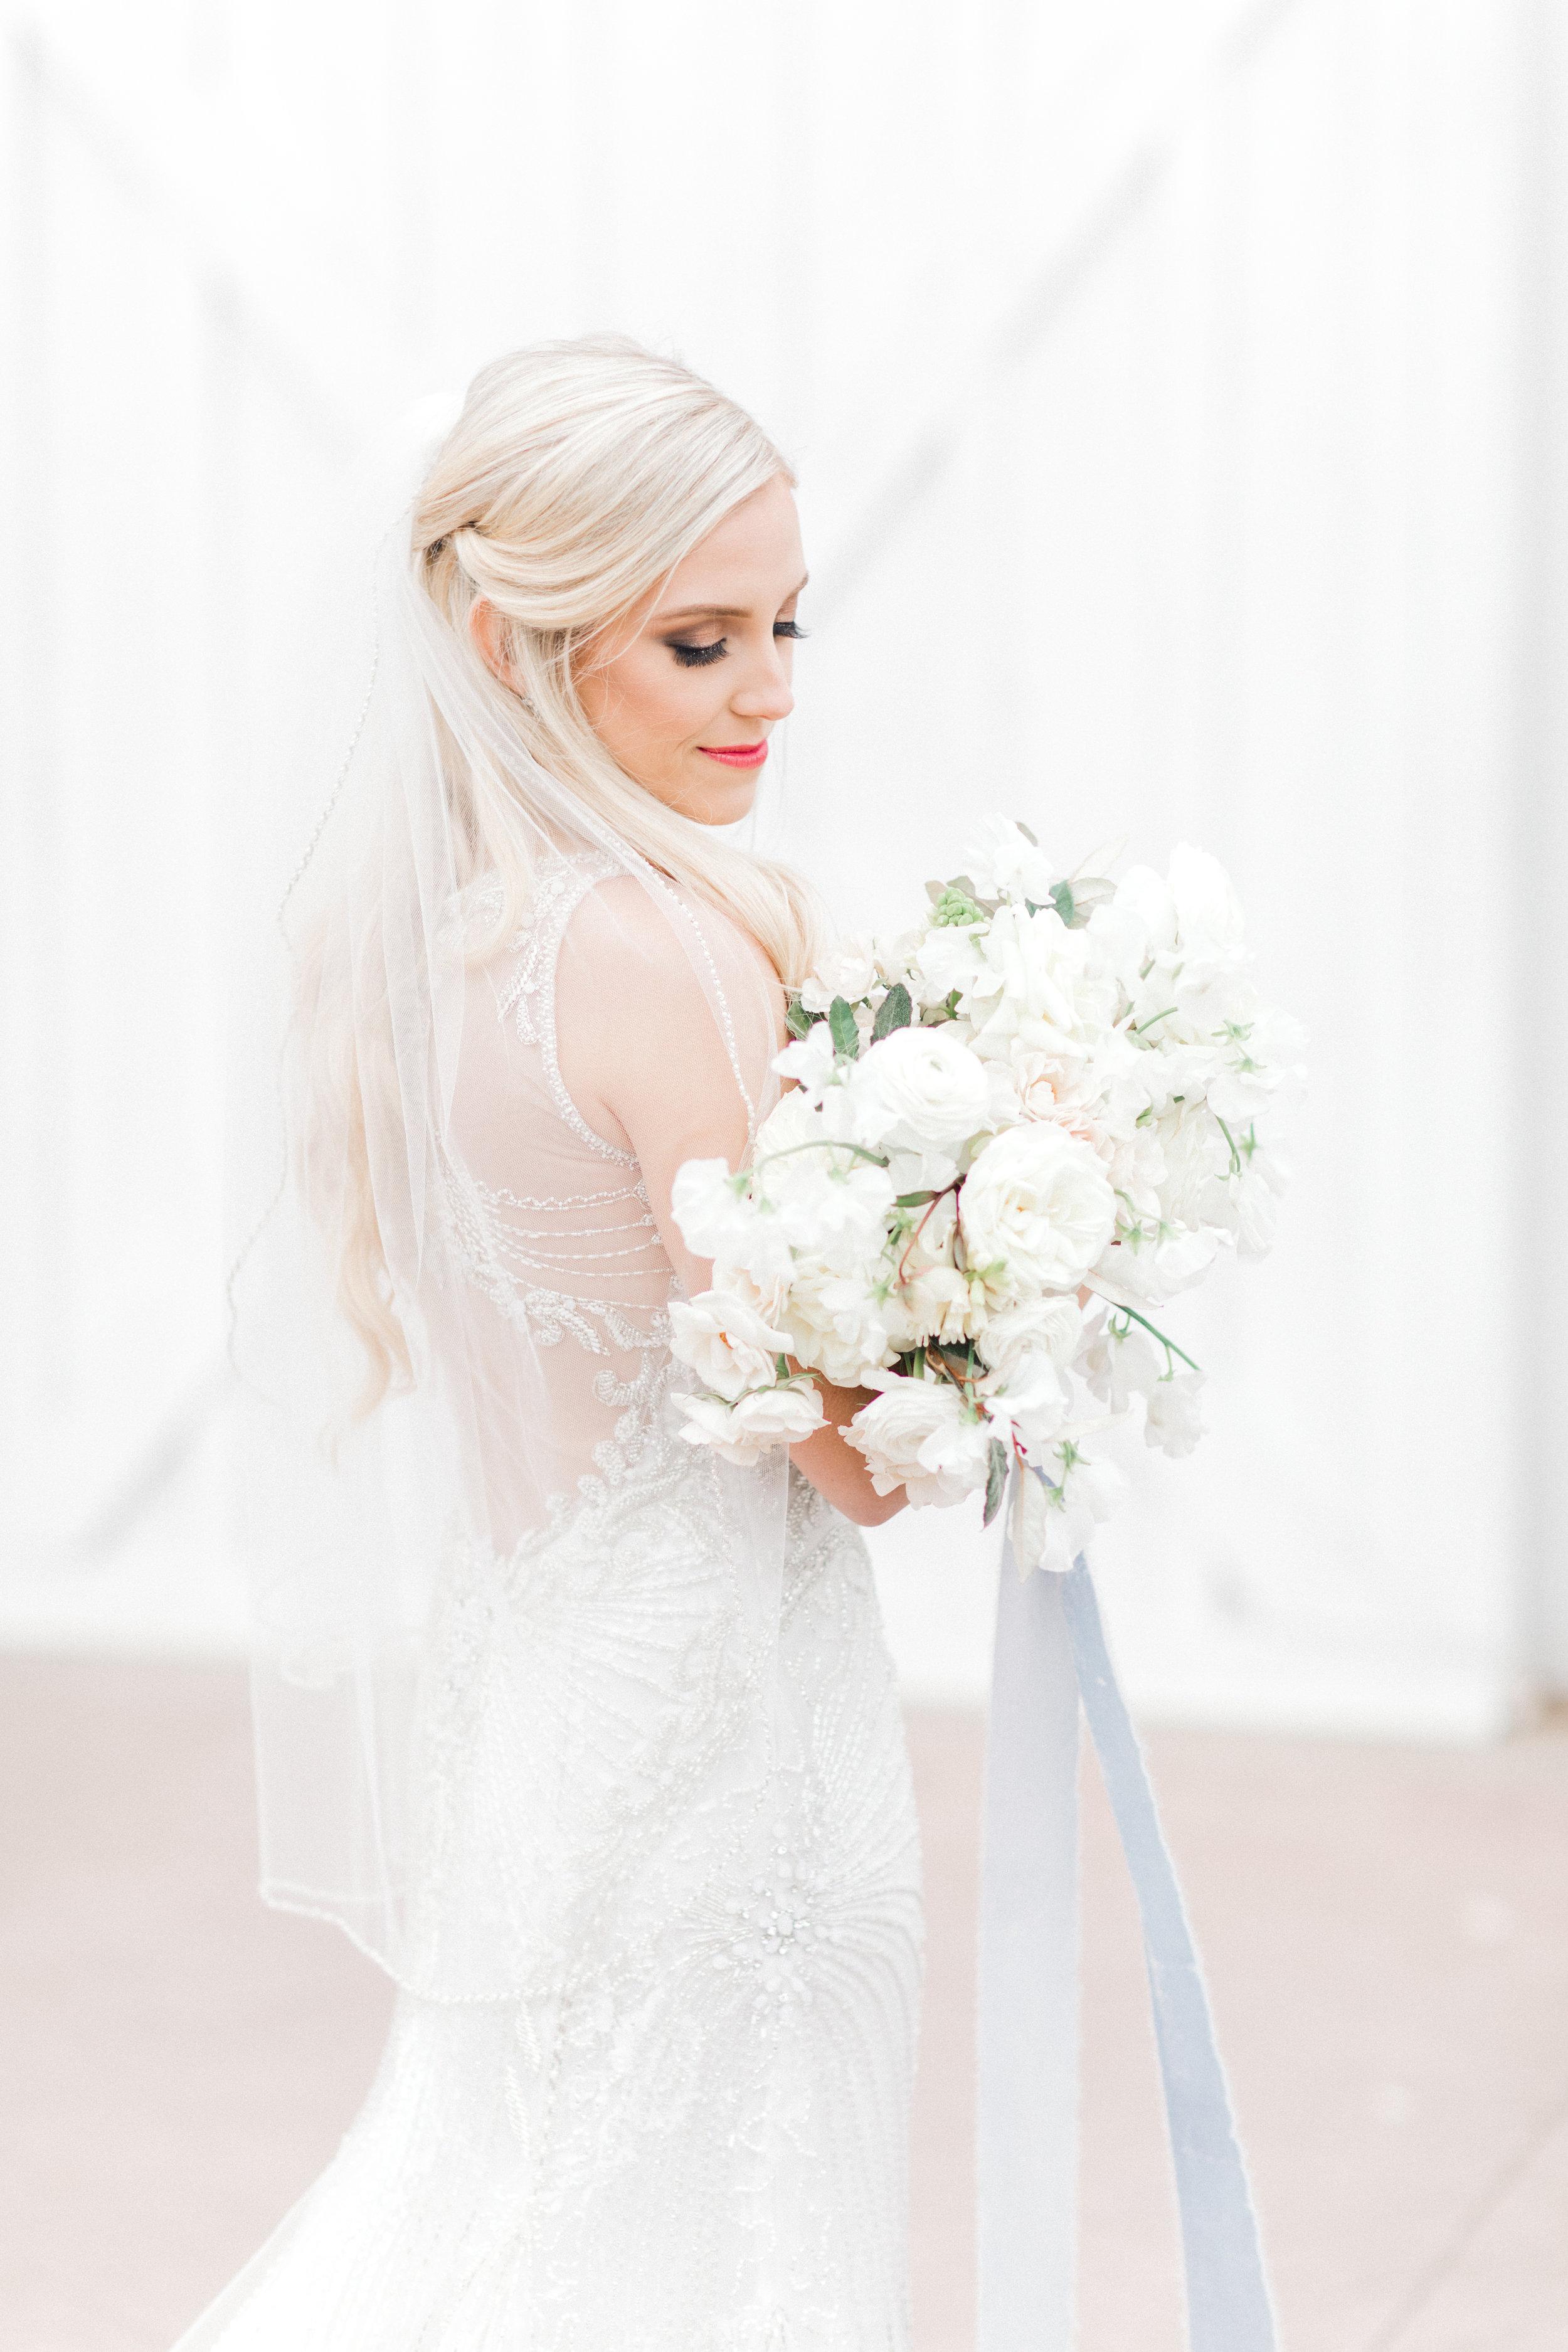 Chloe+Austin Wedding_732.JPG